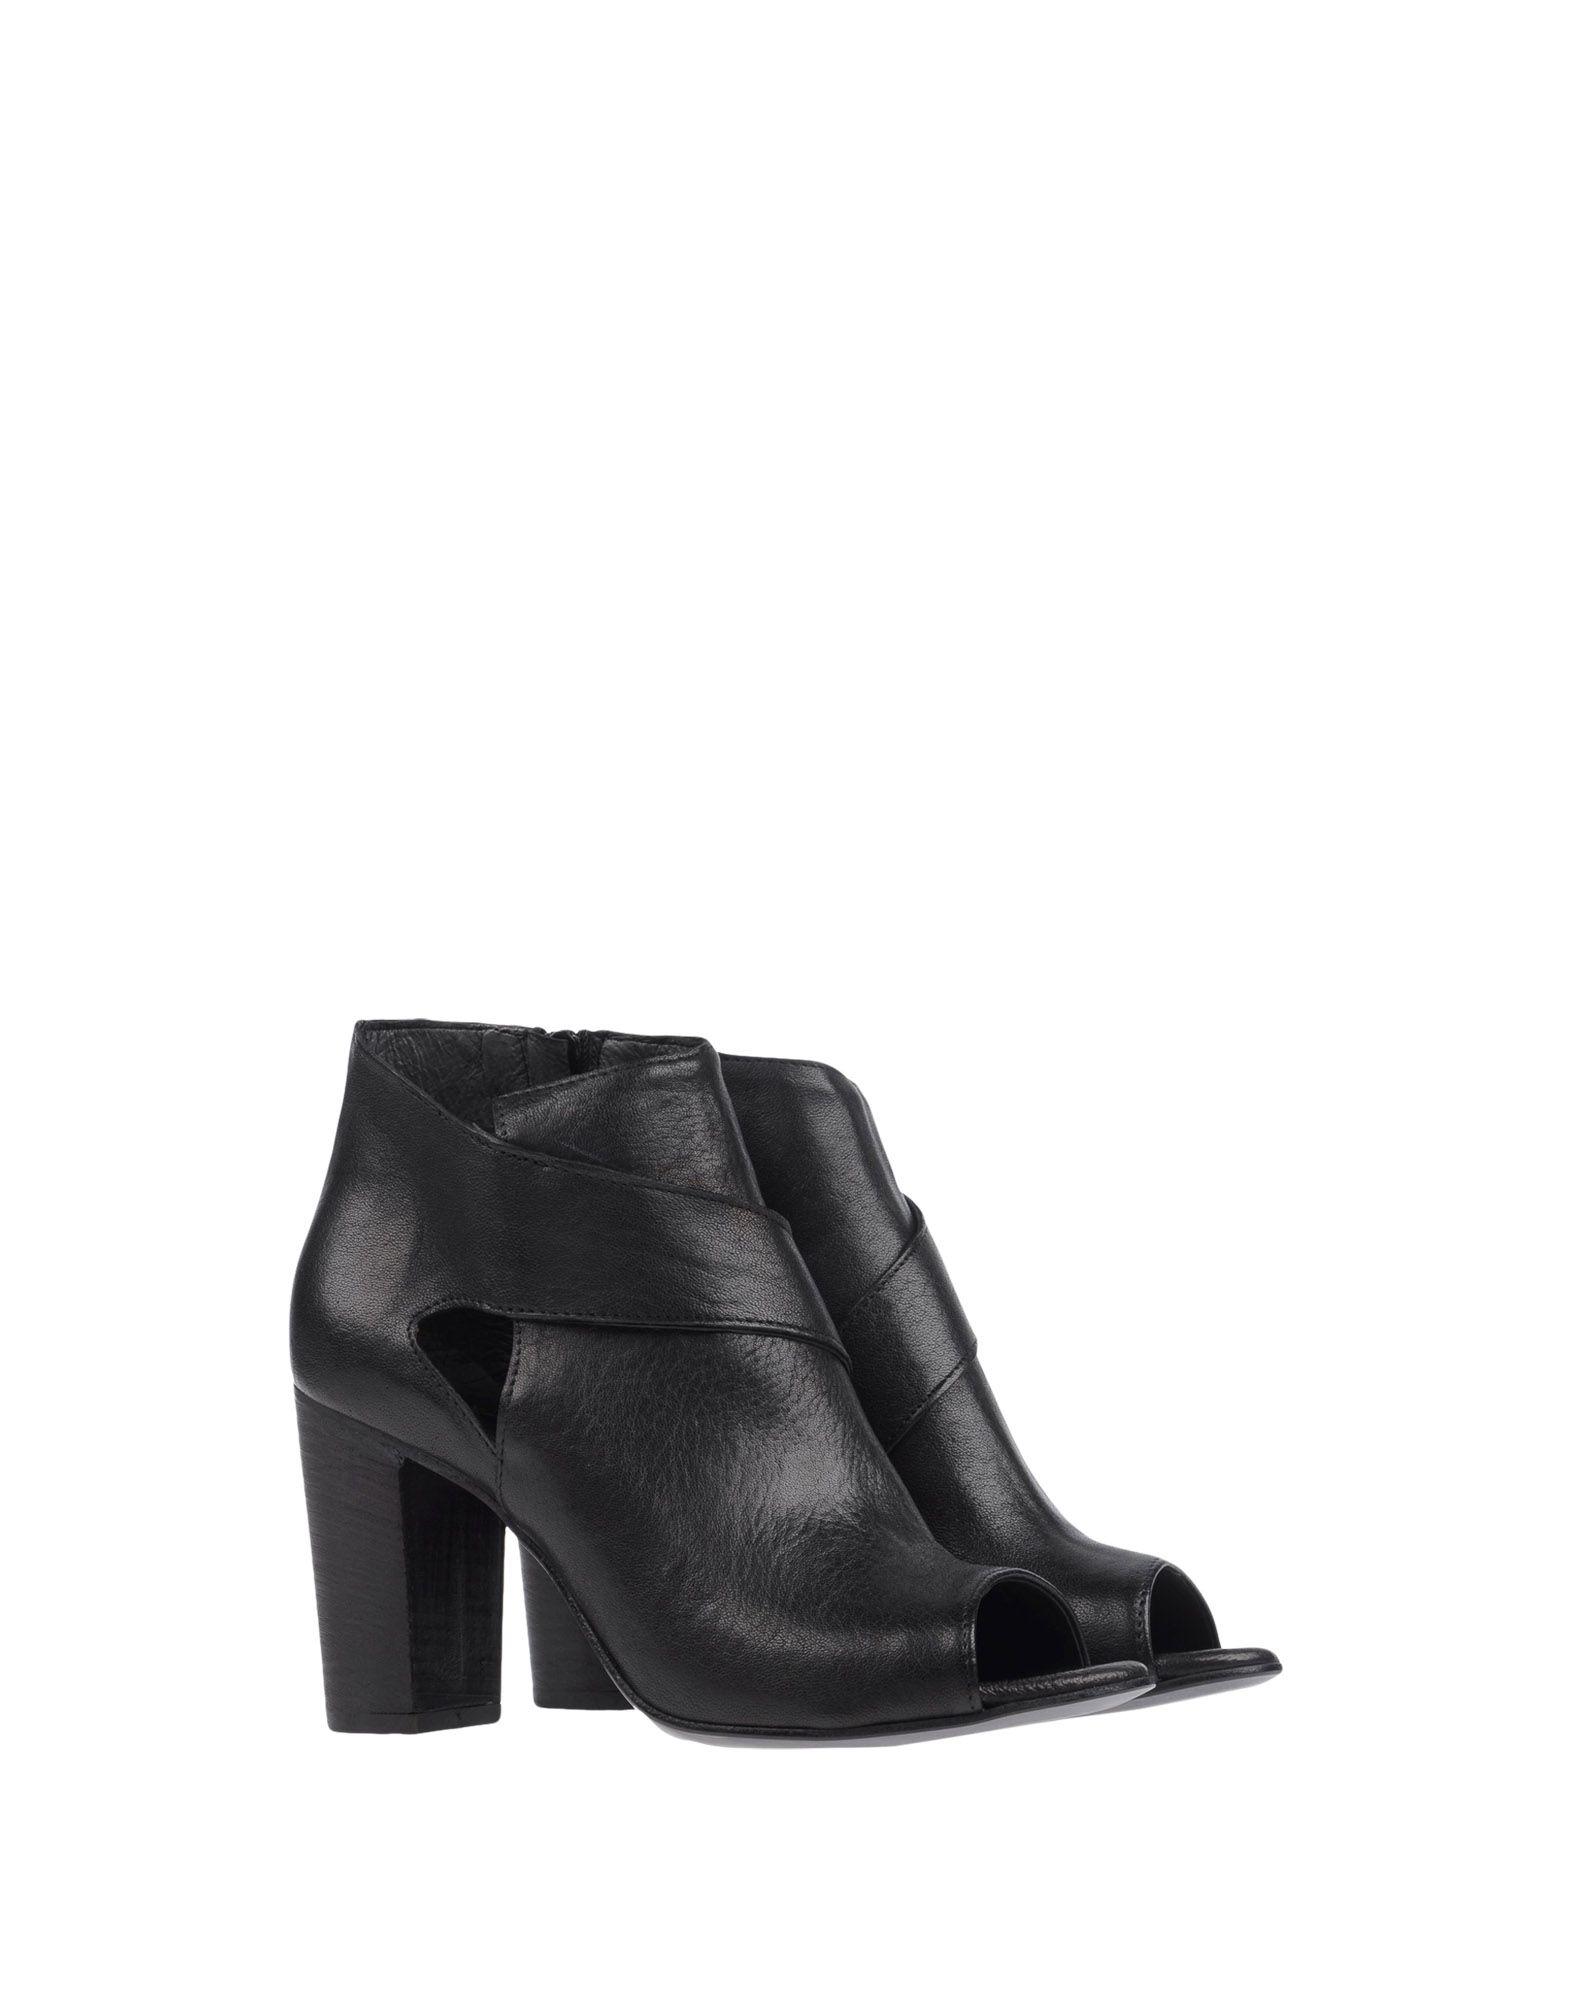 Lady Kiara Stiefelette Damen  11209451OE Gute Qualität beliebte Schuhe